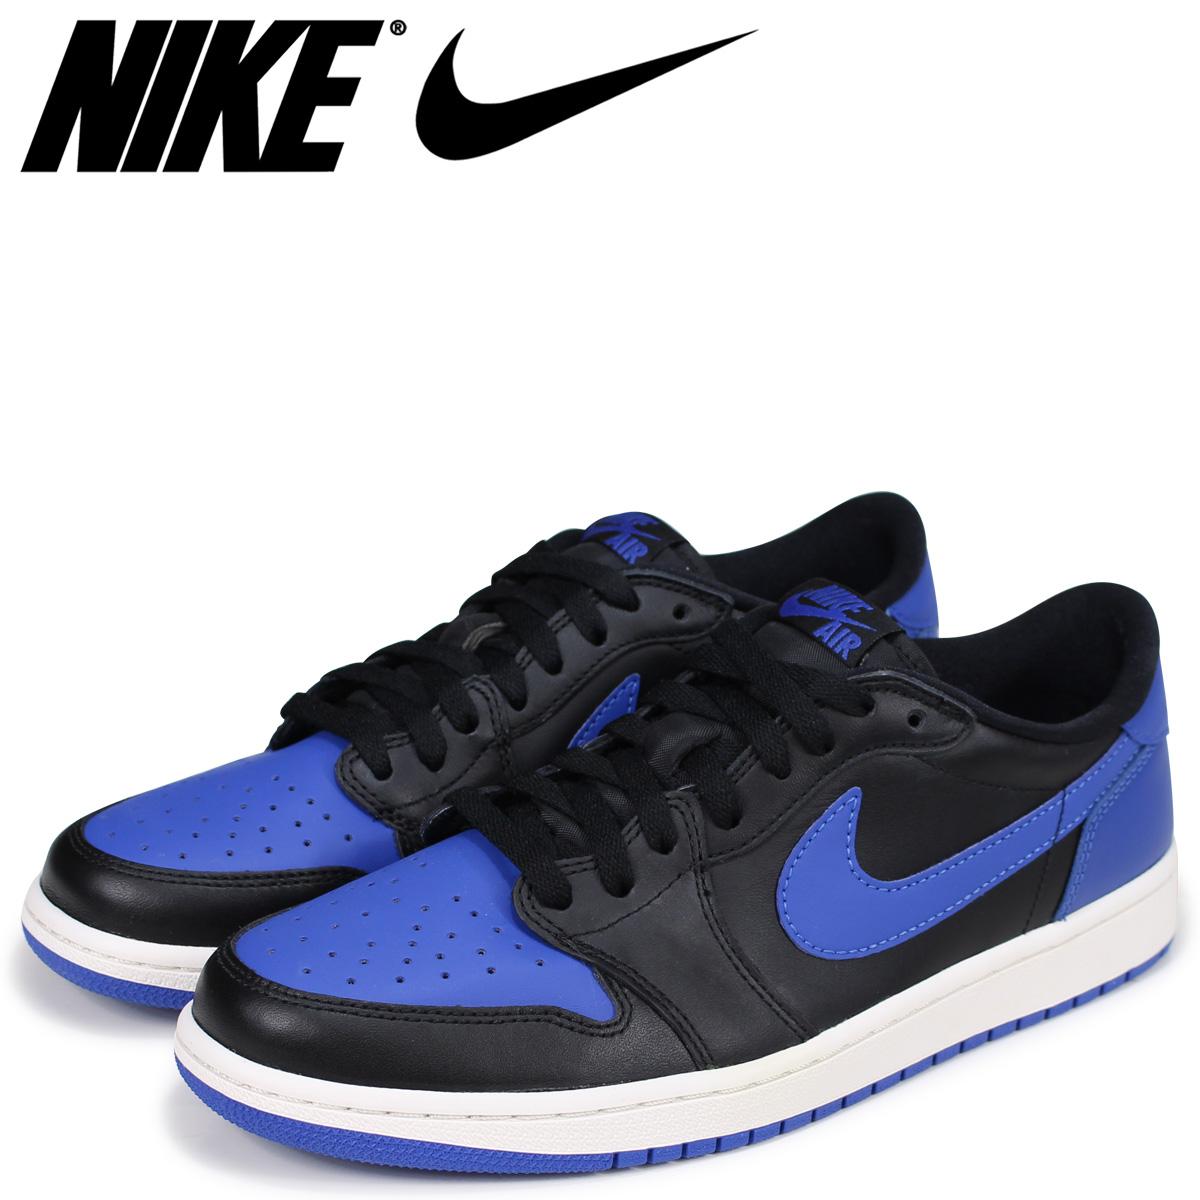 official photos 9eeaa 8be7c Nike NIKE Air Jordan sneakers AIR JORDAN 1 RETRO LOW OG Air Jordan 1 retro  low 705329-004 blue mens shoes